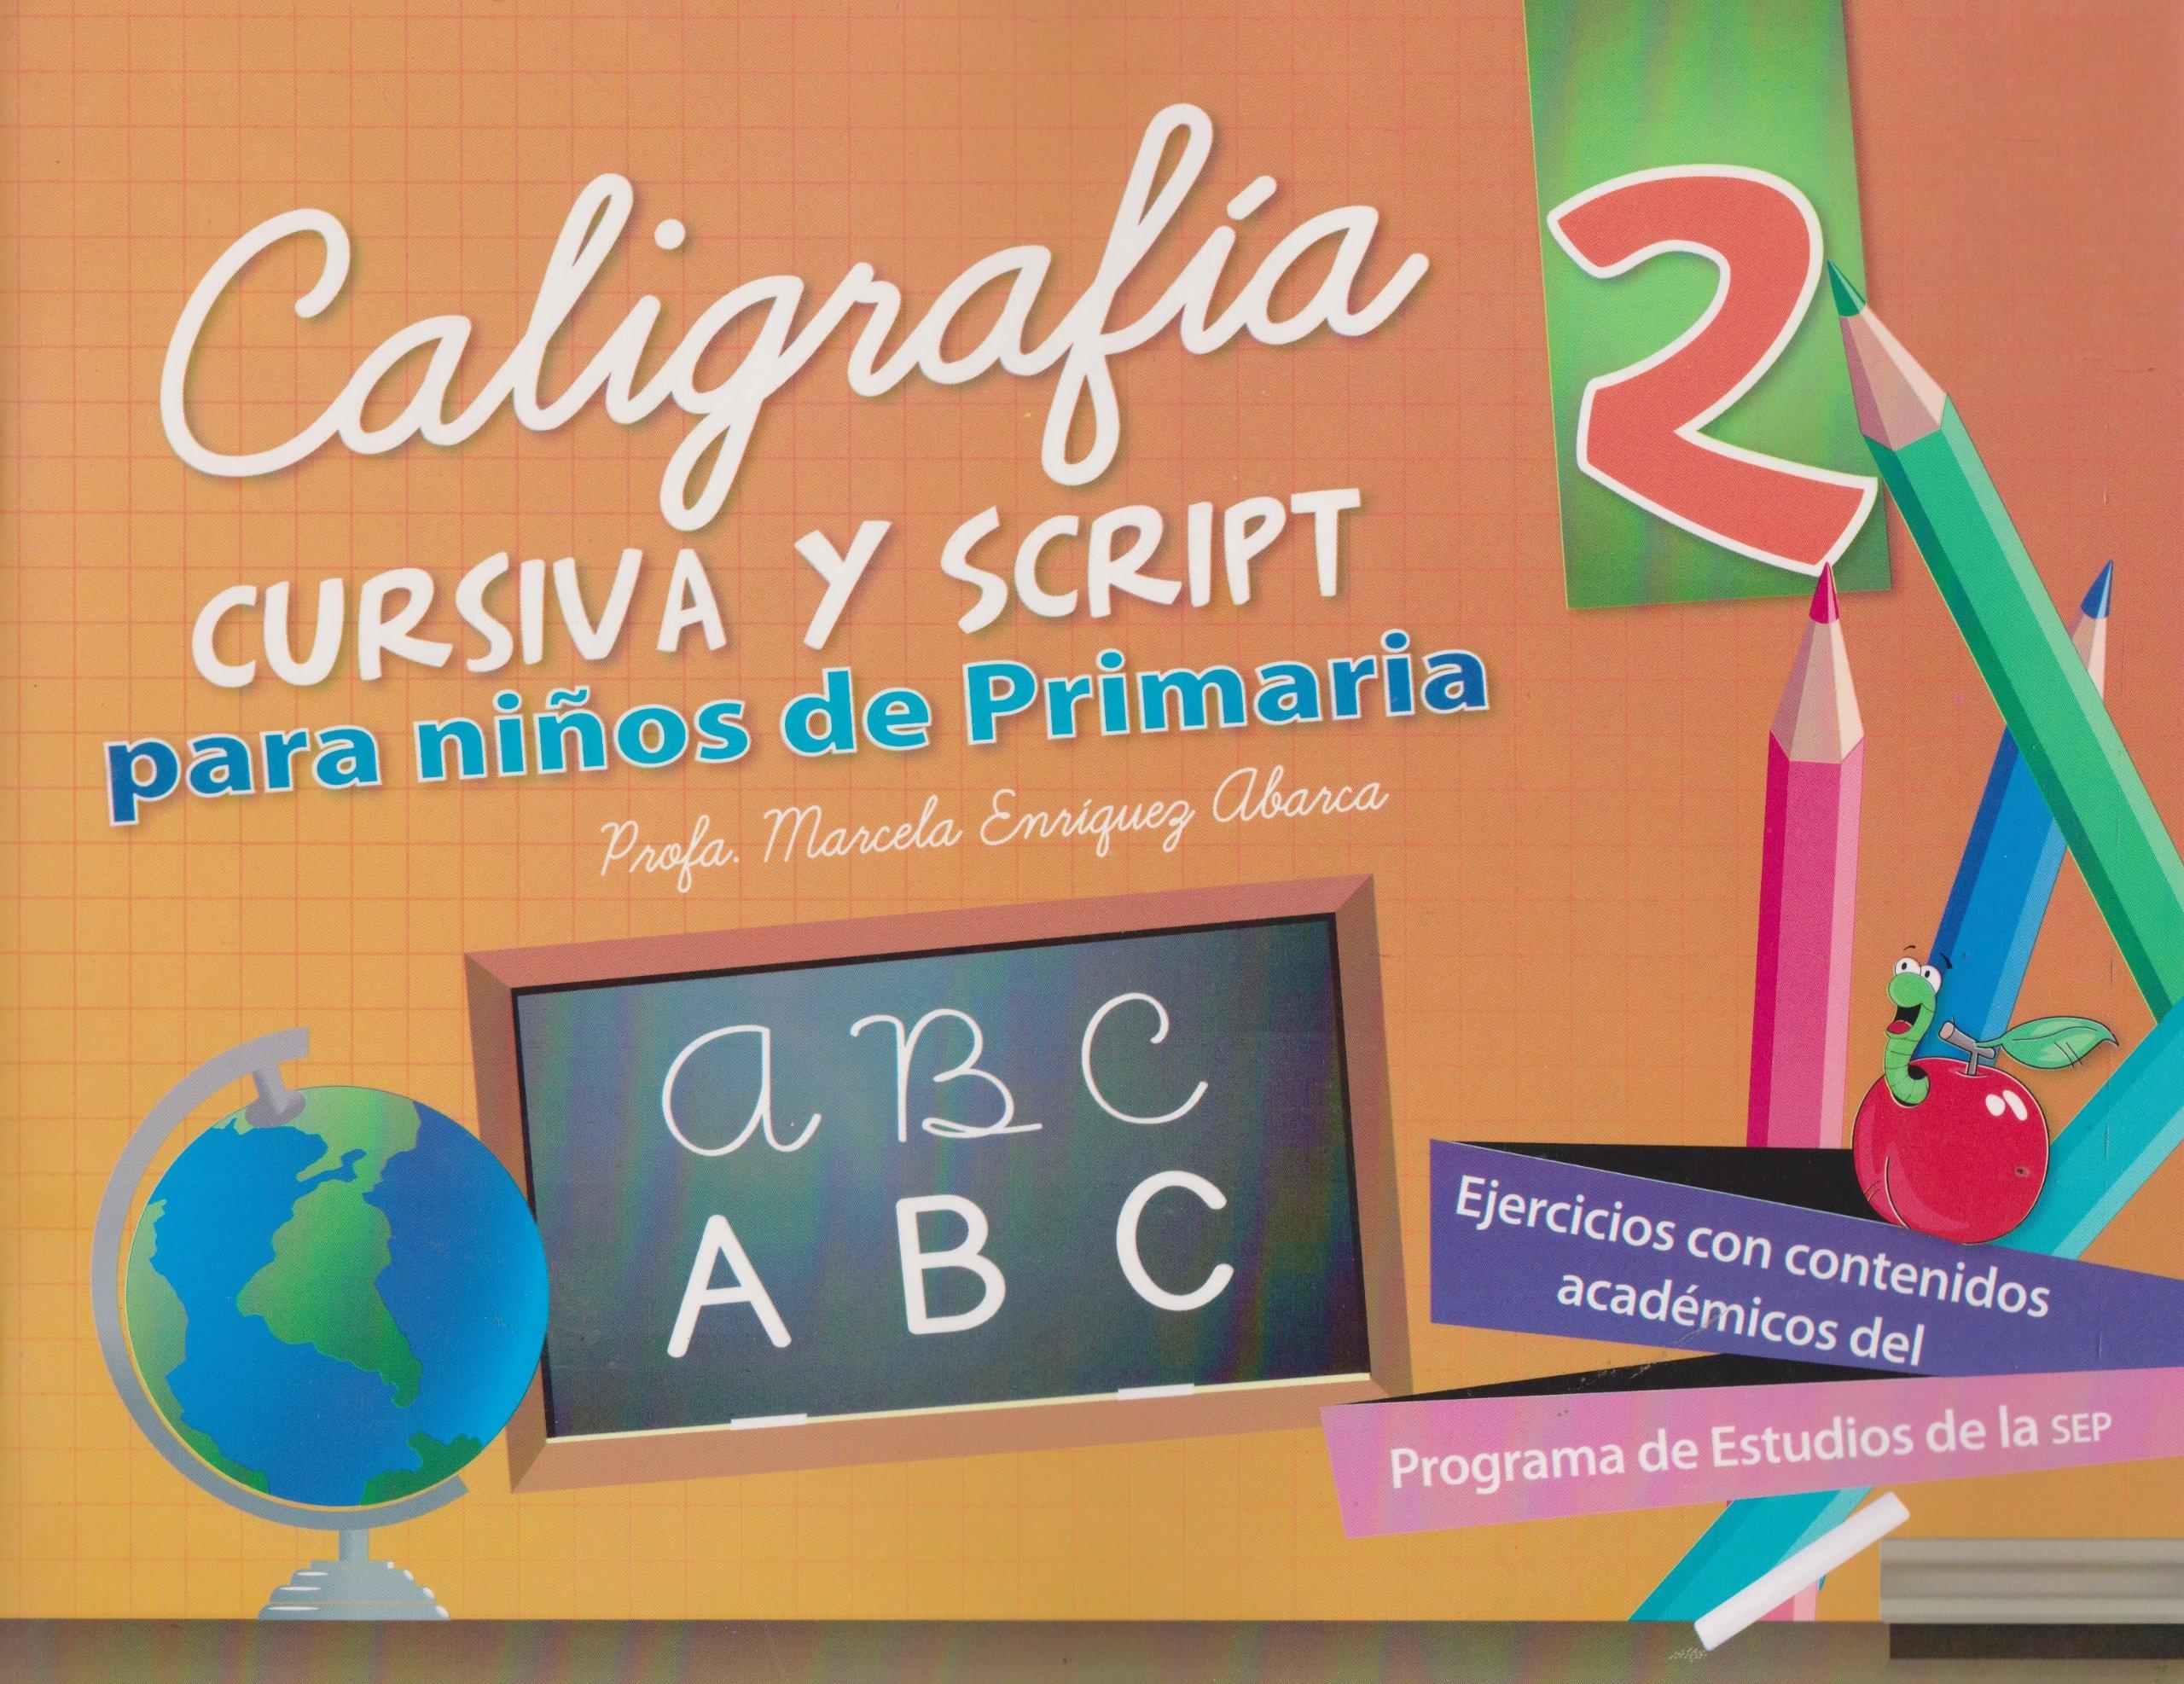 Caligrafia cursiva y script 2 para ninos de primaria (Spanish Edition): Marcela Profa. Enriquez Abarca: 9786071408228: Amazon.com: Books